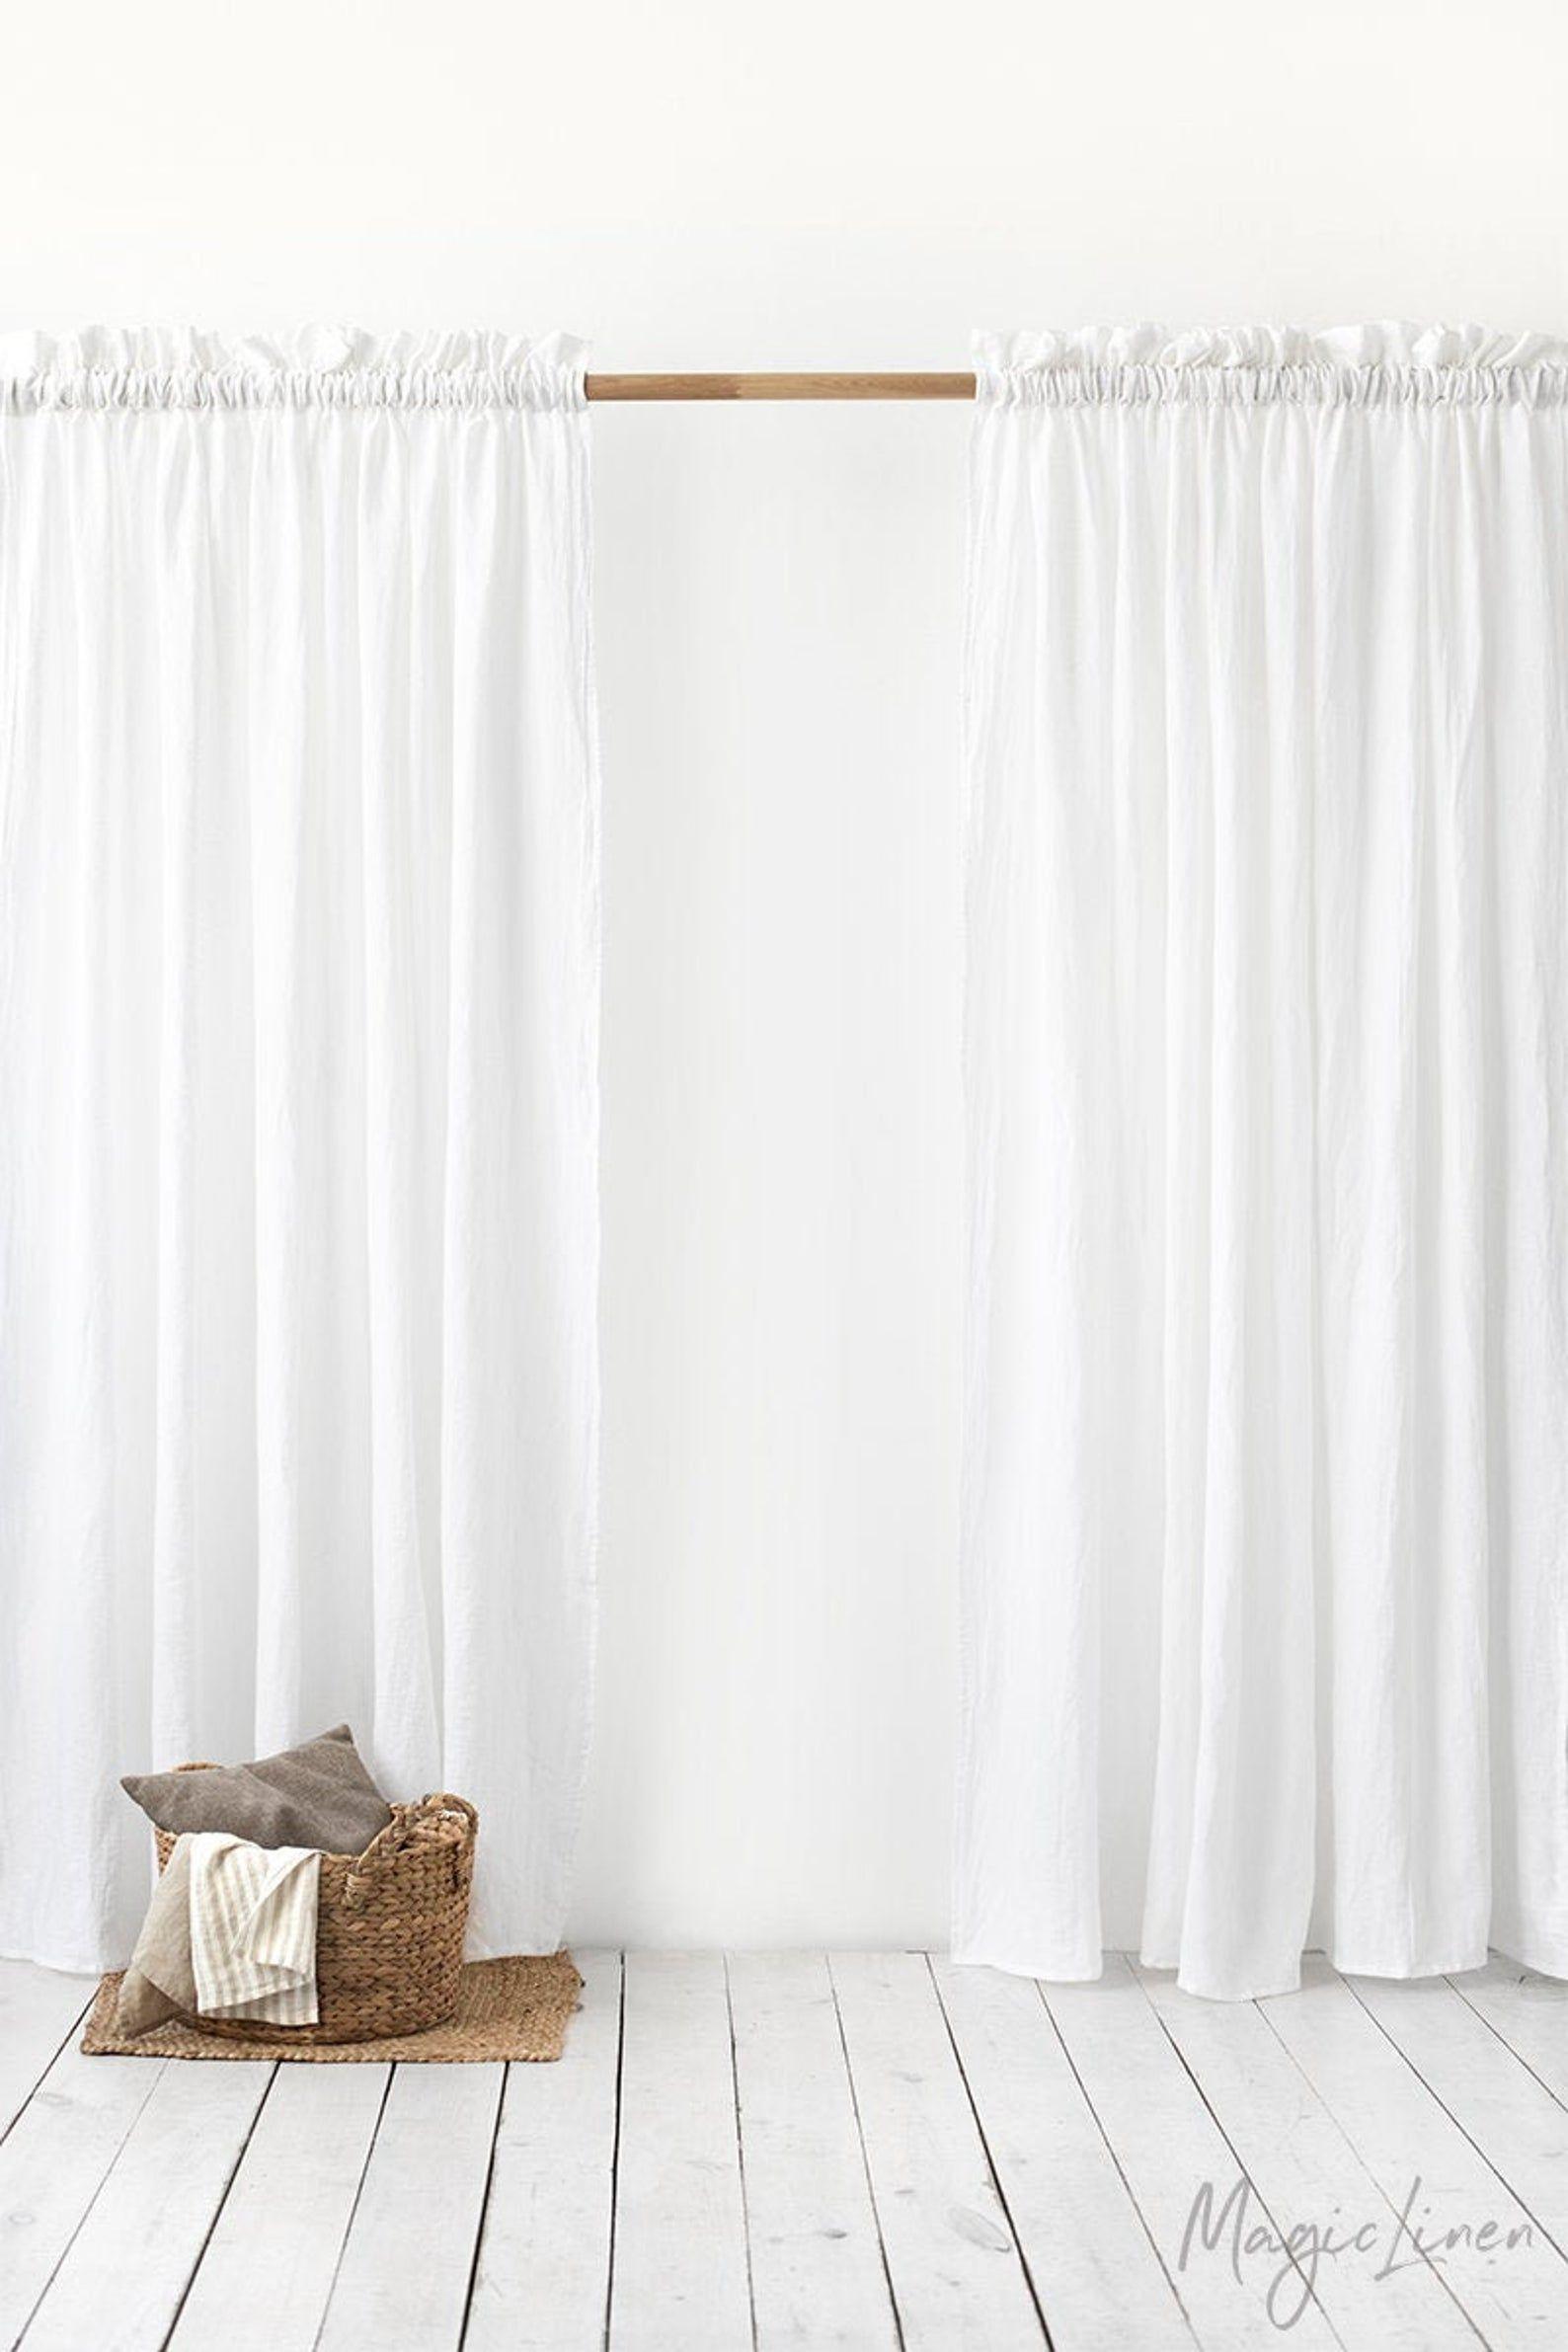 Rod Pocket Linen Curtain Panel With Decorative Header Custom Sized Door Window Curtain In 2020 Linen Curtain Panels Linen Curtains Panel Curtains